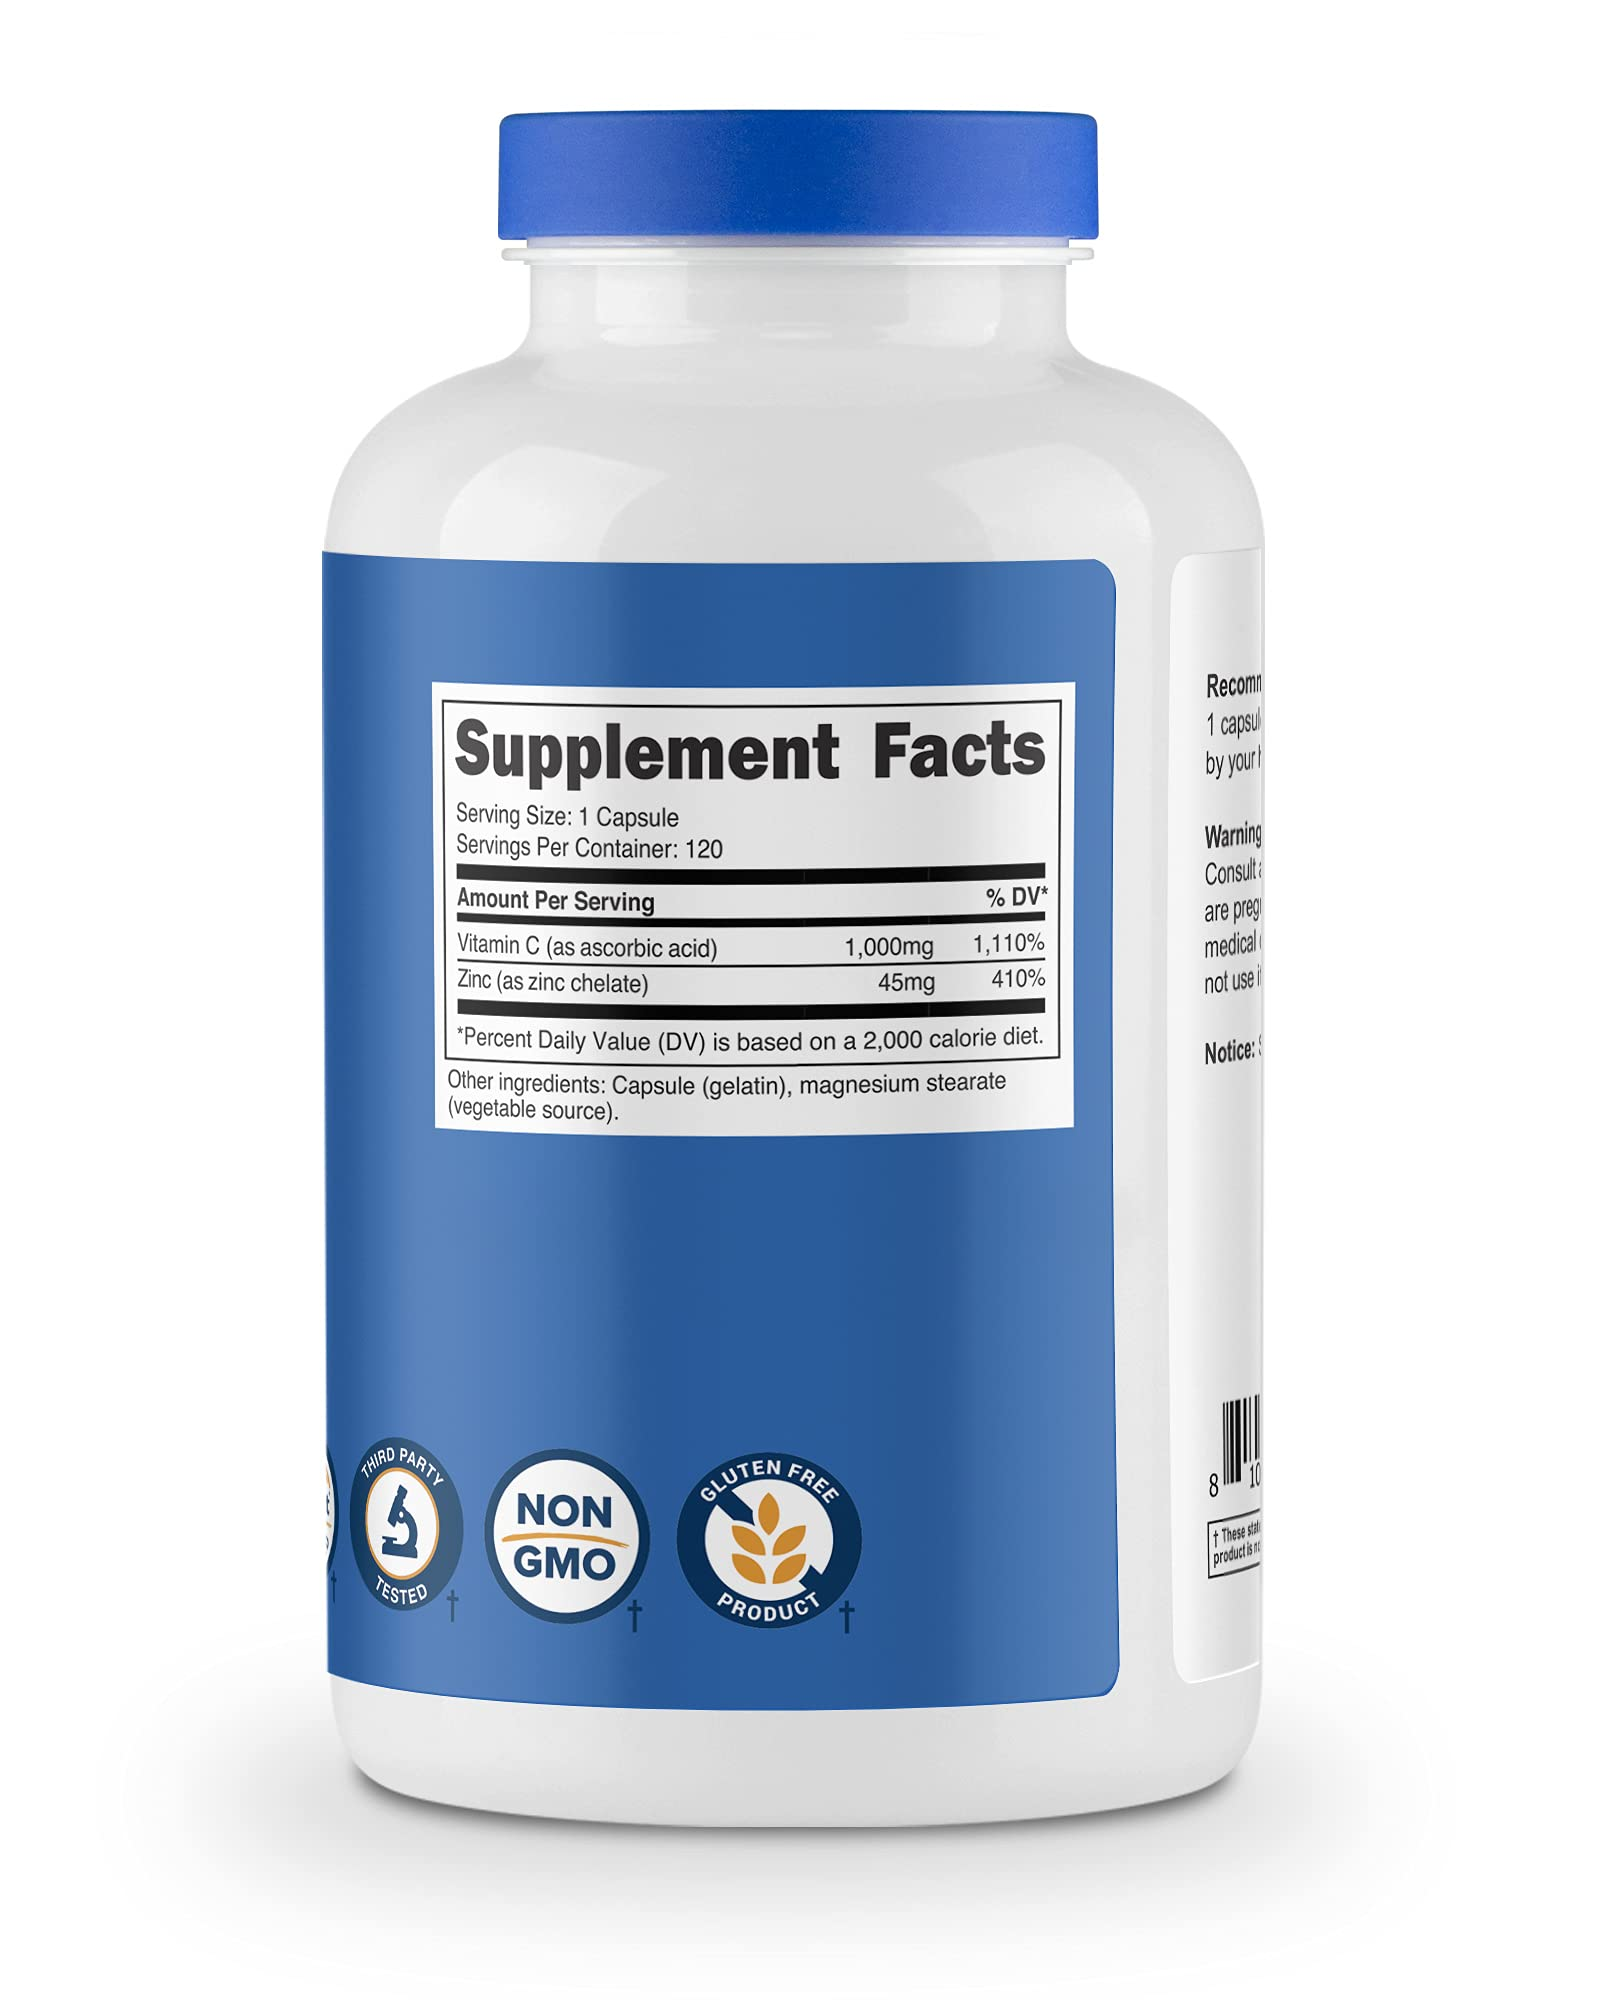 Nutricost Vitamin C with Zinc Capsules, 120 Servings - 1000mg Vitamin C, 45mg Zinc, Non-GMO, Gluten Free Vitamin C Supplement